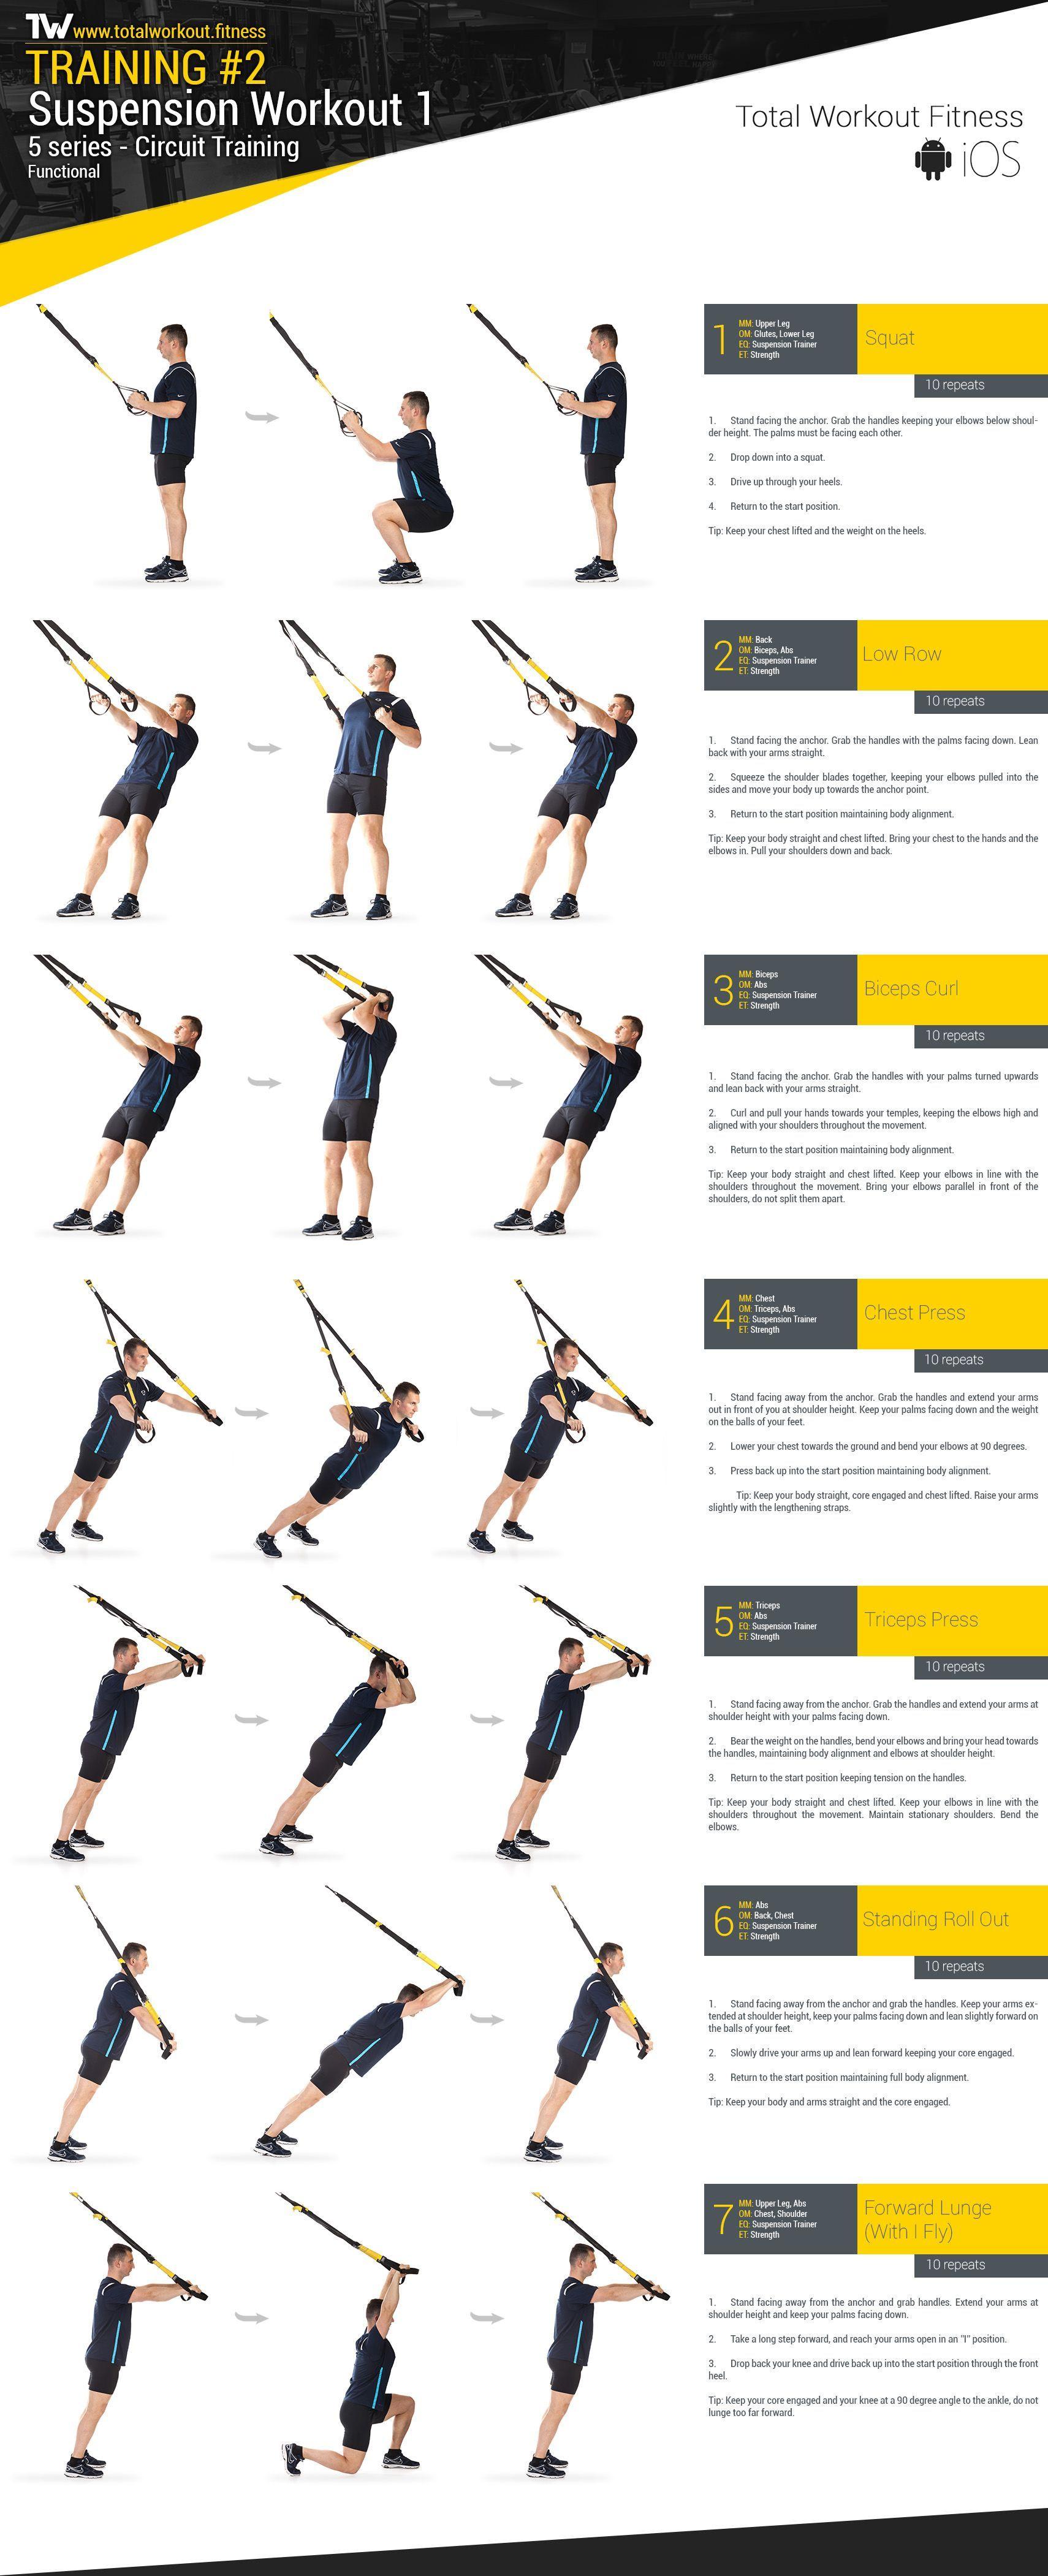 Training 2 Suspension Workout 1 Total Workout Fitness Http Www Weightlossjumpsstarts Com Best Workout For Your Total Workout Trx Workouts Trx Training